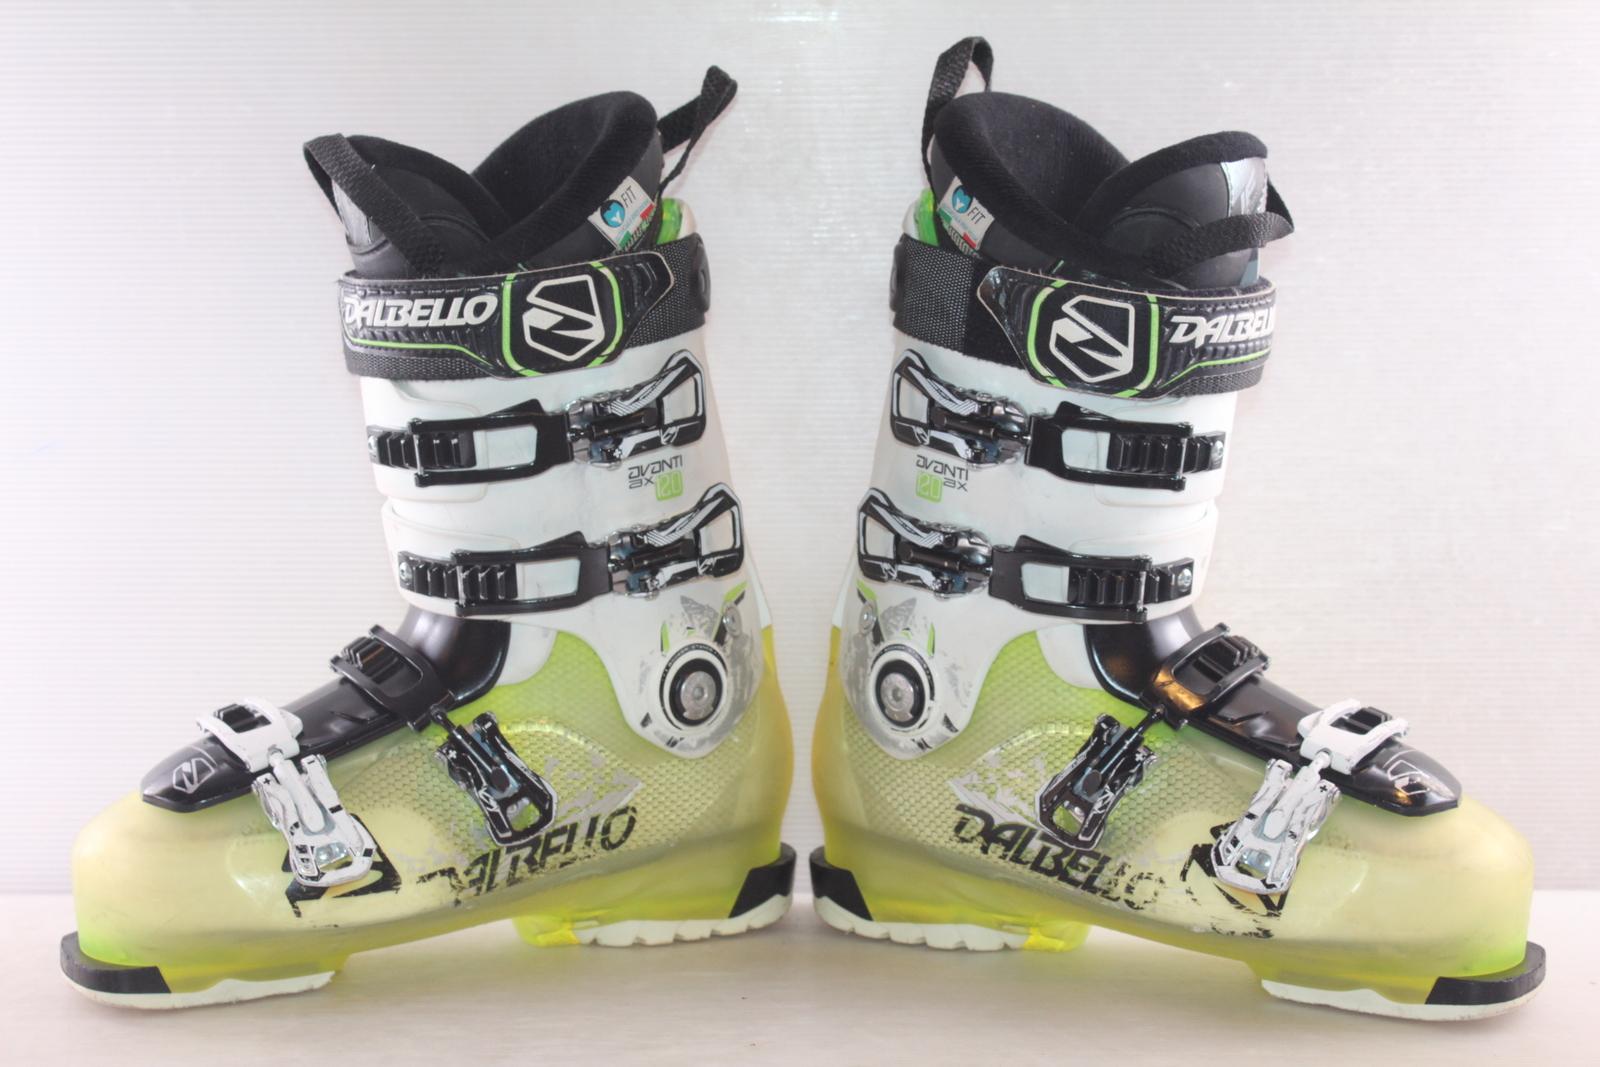 Lyžařské boty Dalbello Avanti 120 AX vel. EU42.5 flexe 120